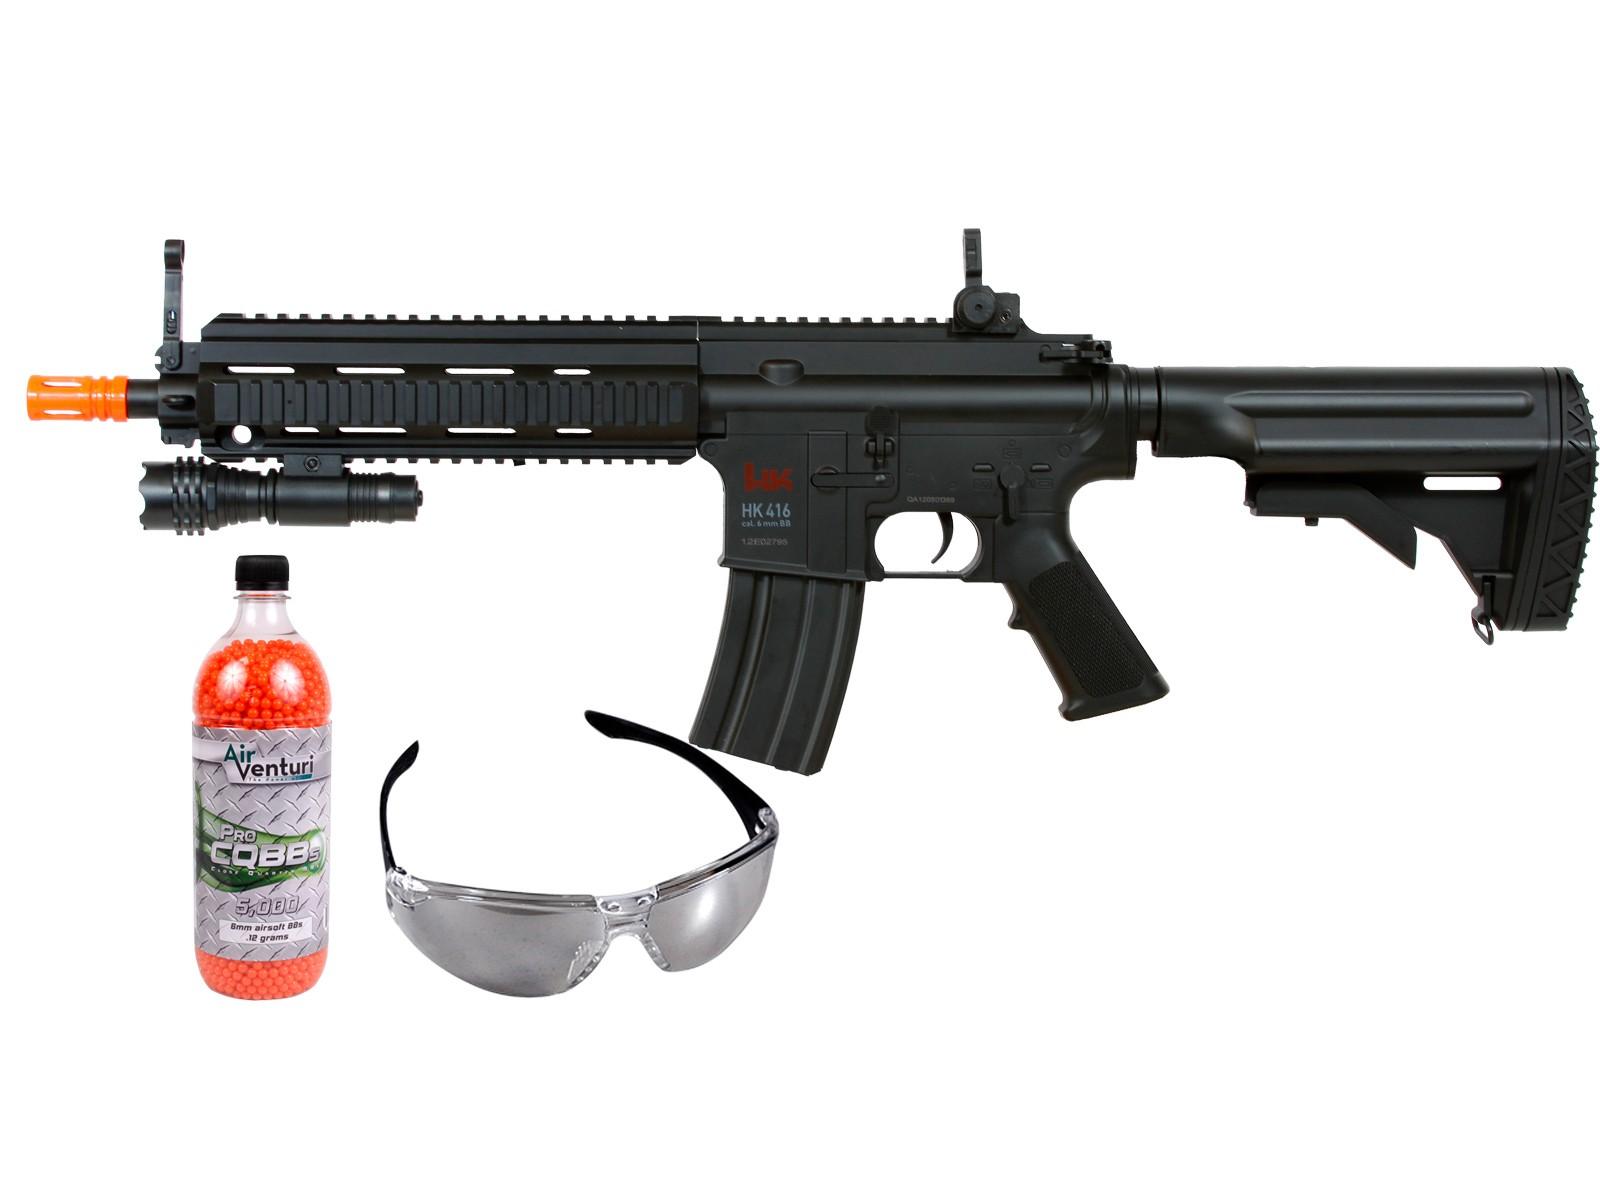 H&K_416_AEG_Tactical_Airsoft_Rifle_Kit_Black_6mm